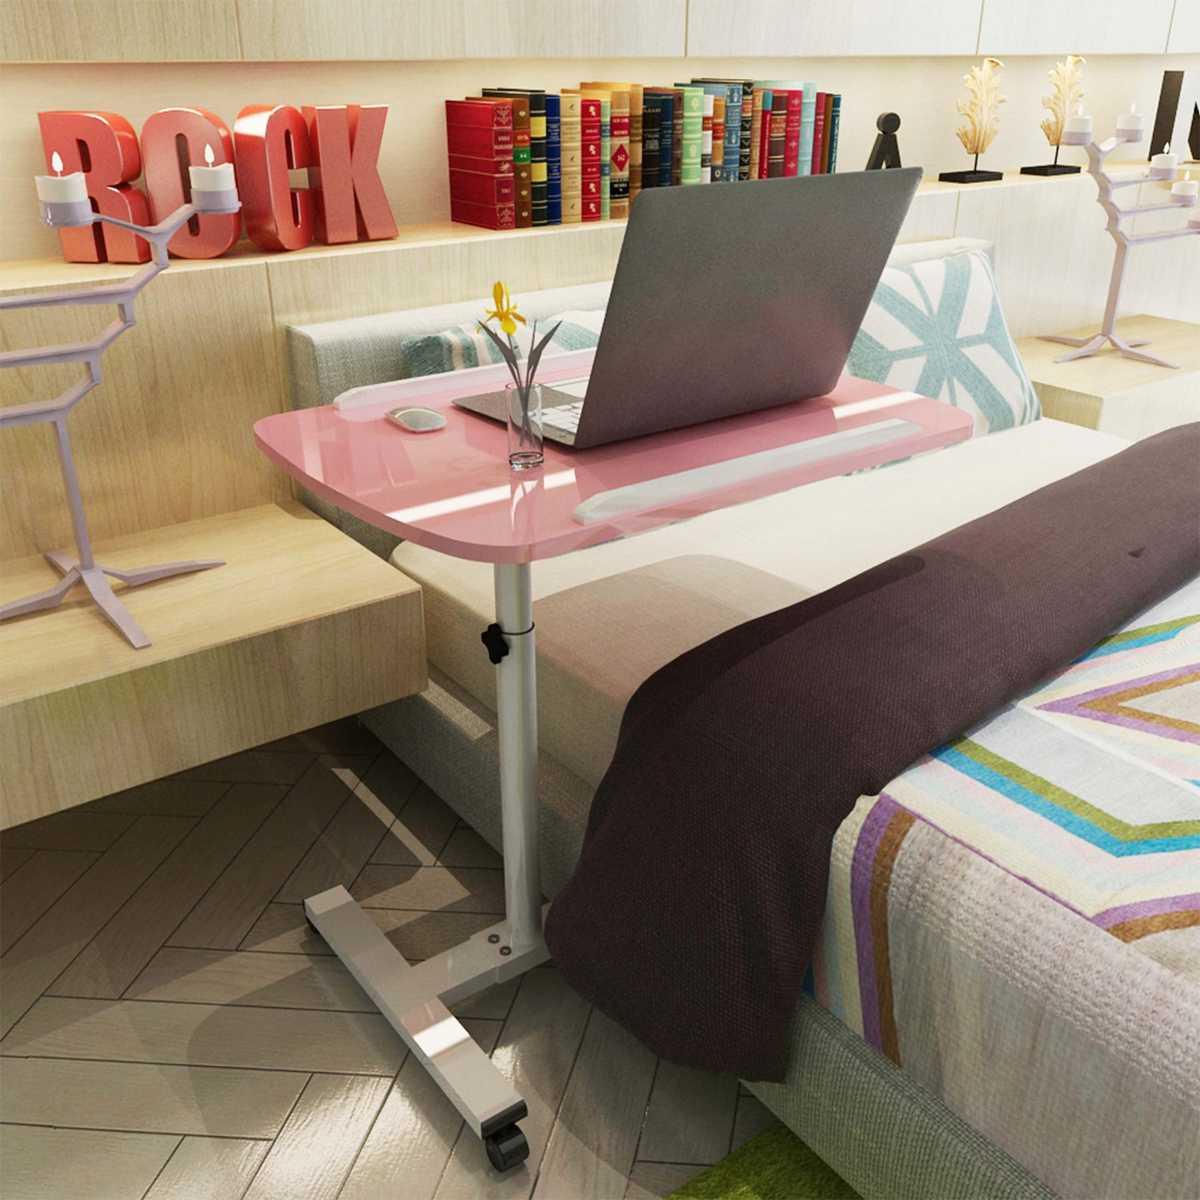 Mesa portátil extraíble, mesa de escritorio, mesa de escritorio, mesa de noche, sofá cama, escritorio portátil ajustable para ordenador de casa, 55x32cm